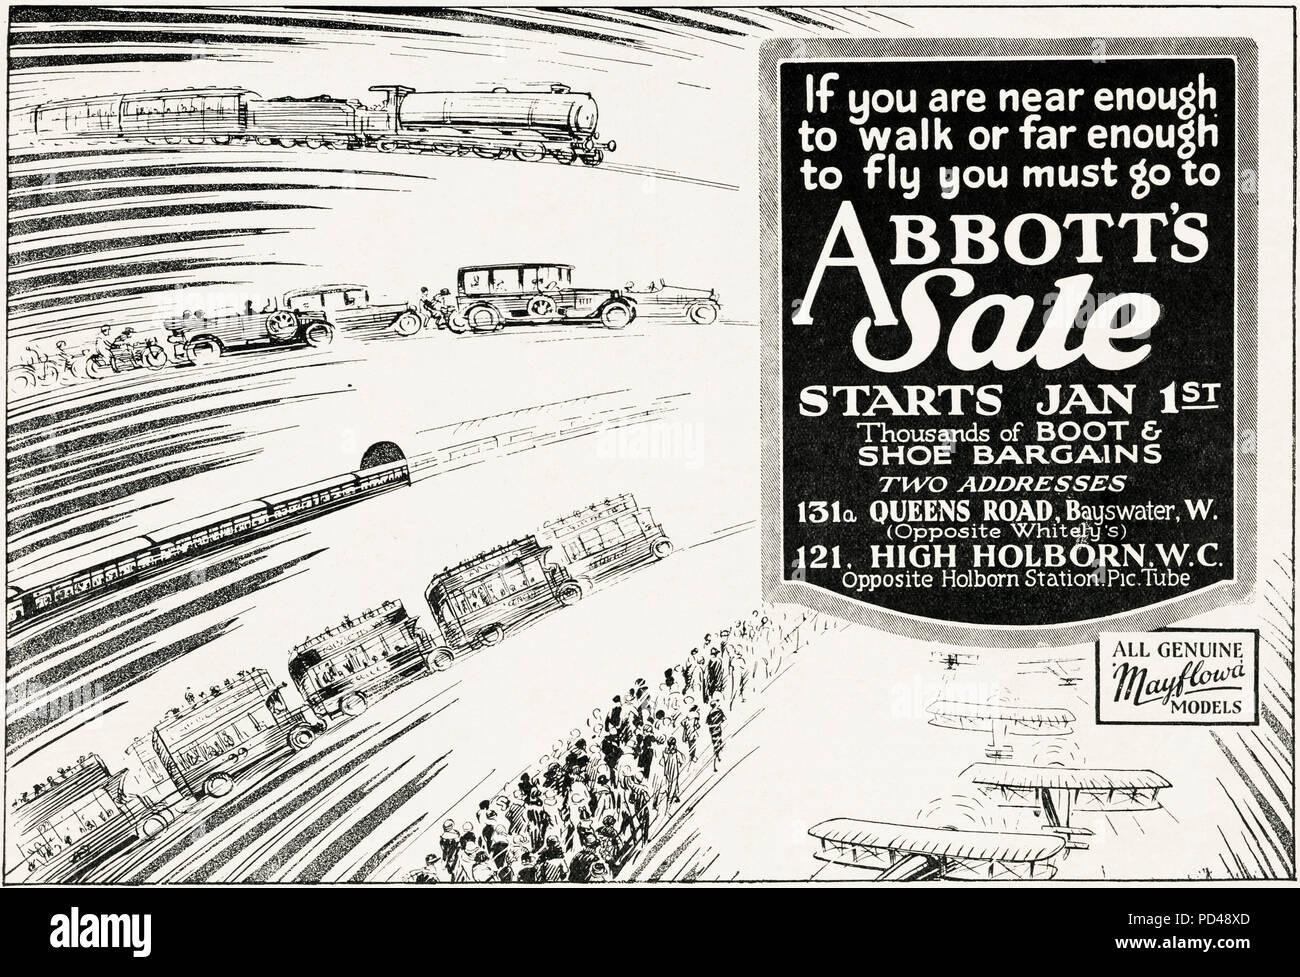 1920s old vintage original advert advertising Abbott's shoe